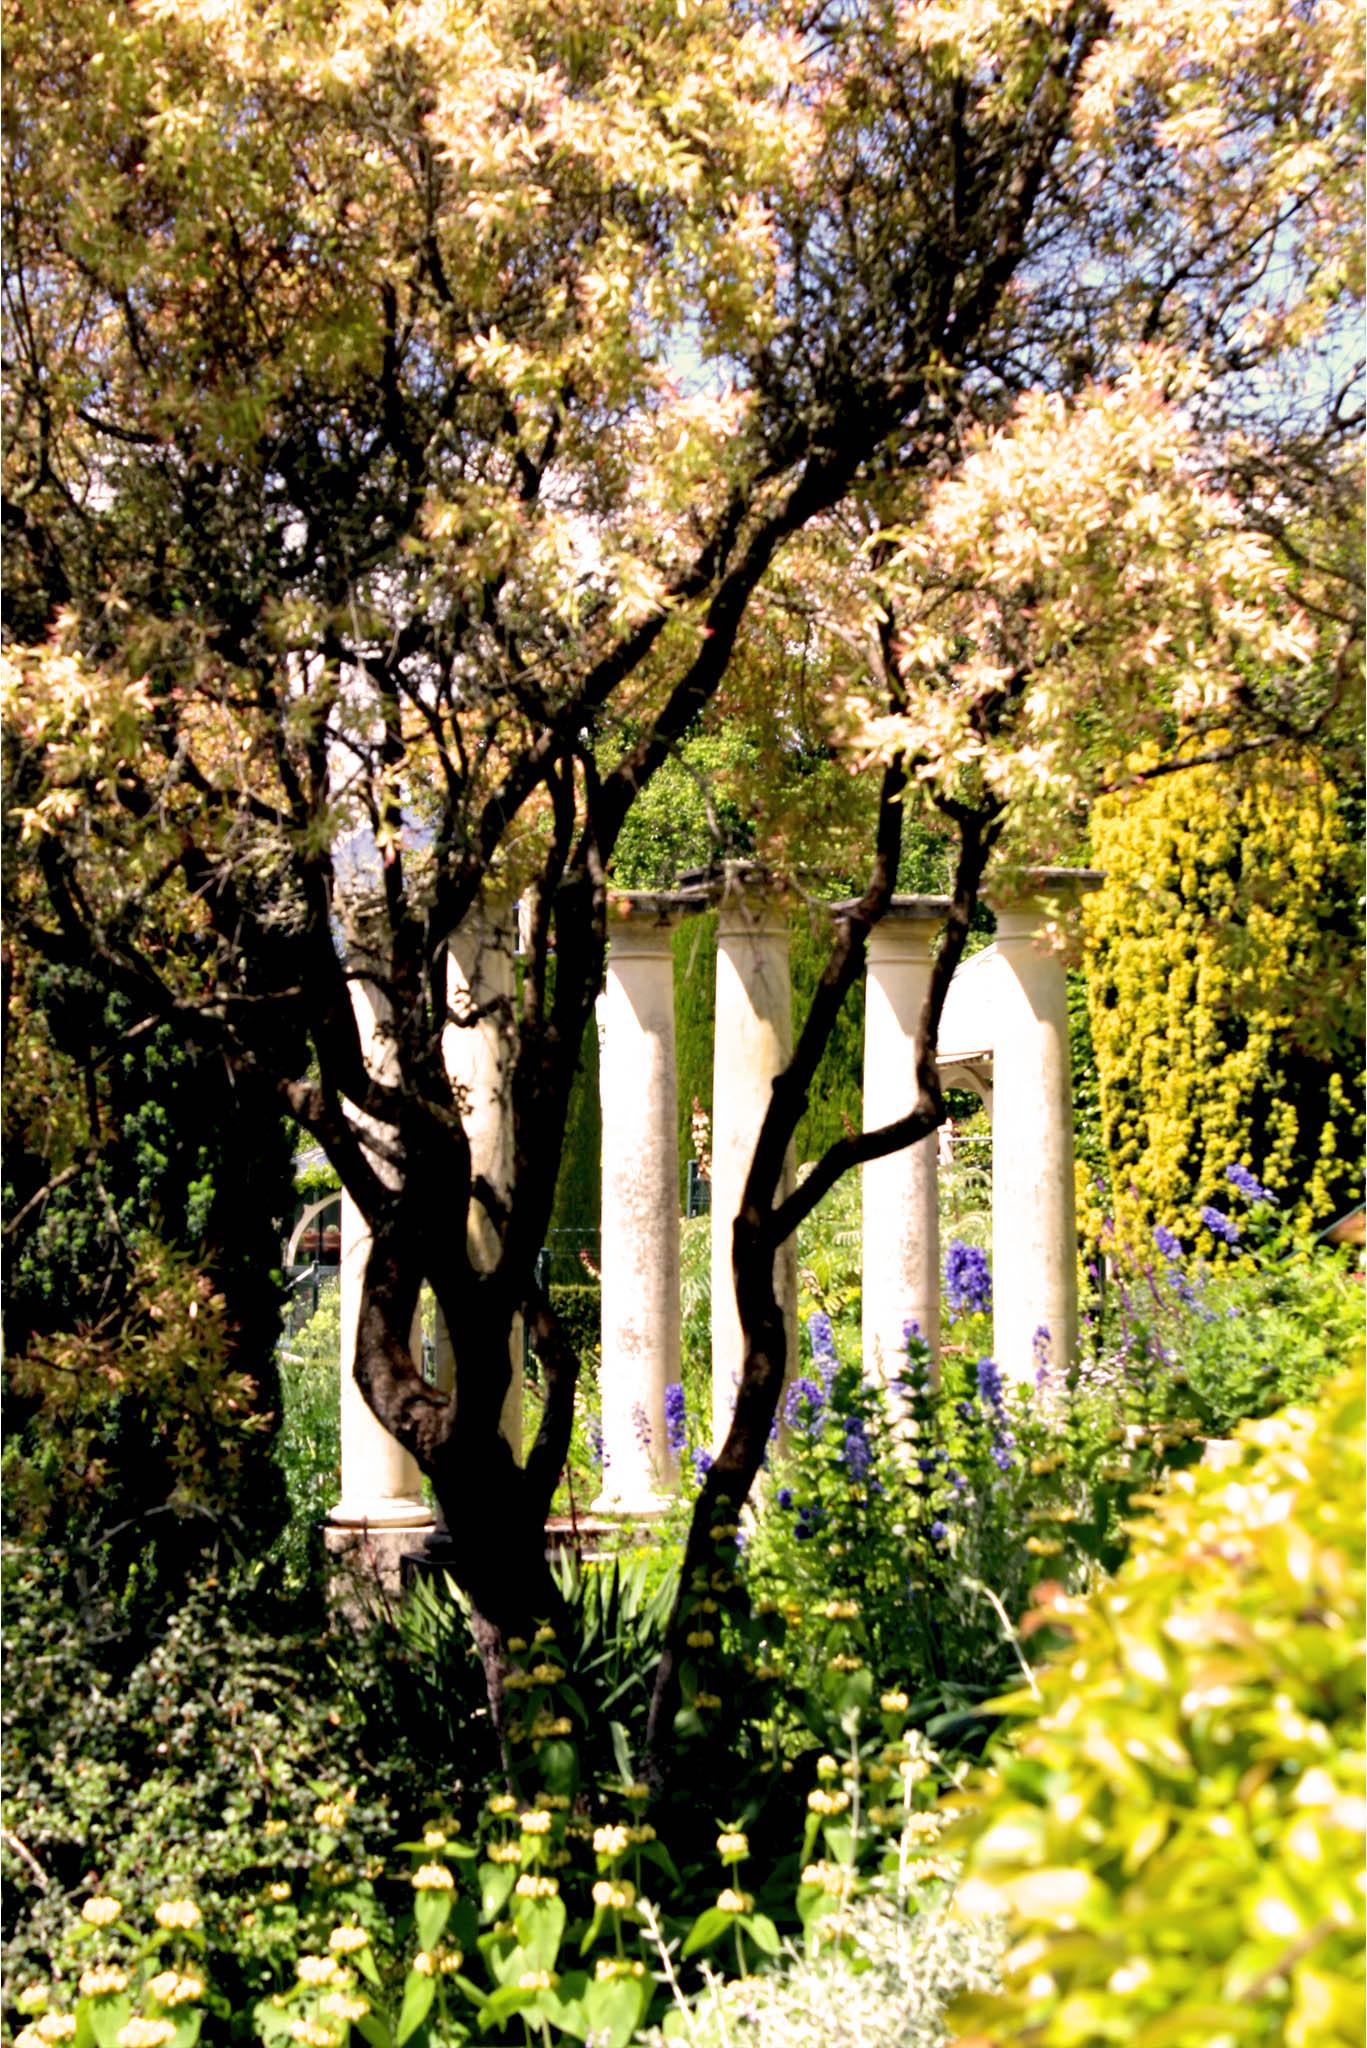 ohinetahi-garden-garden-gartengestaltung-garten-blog